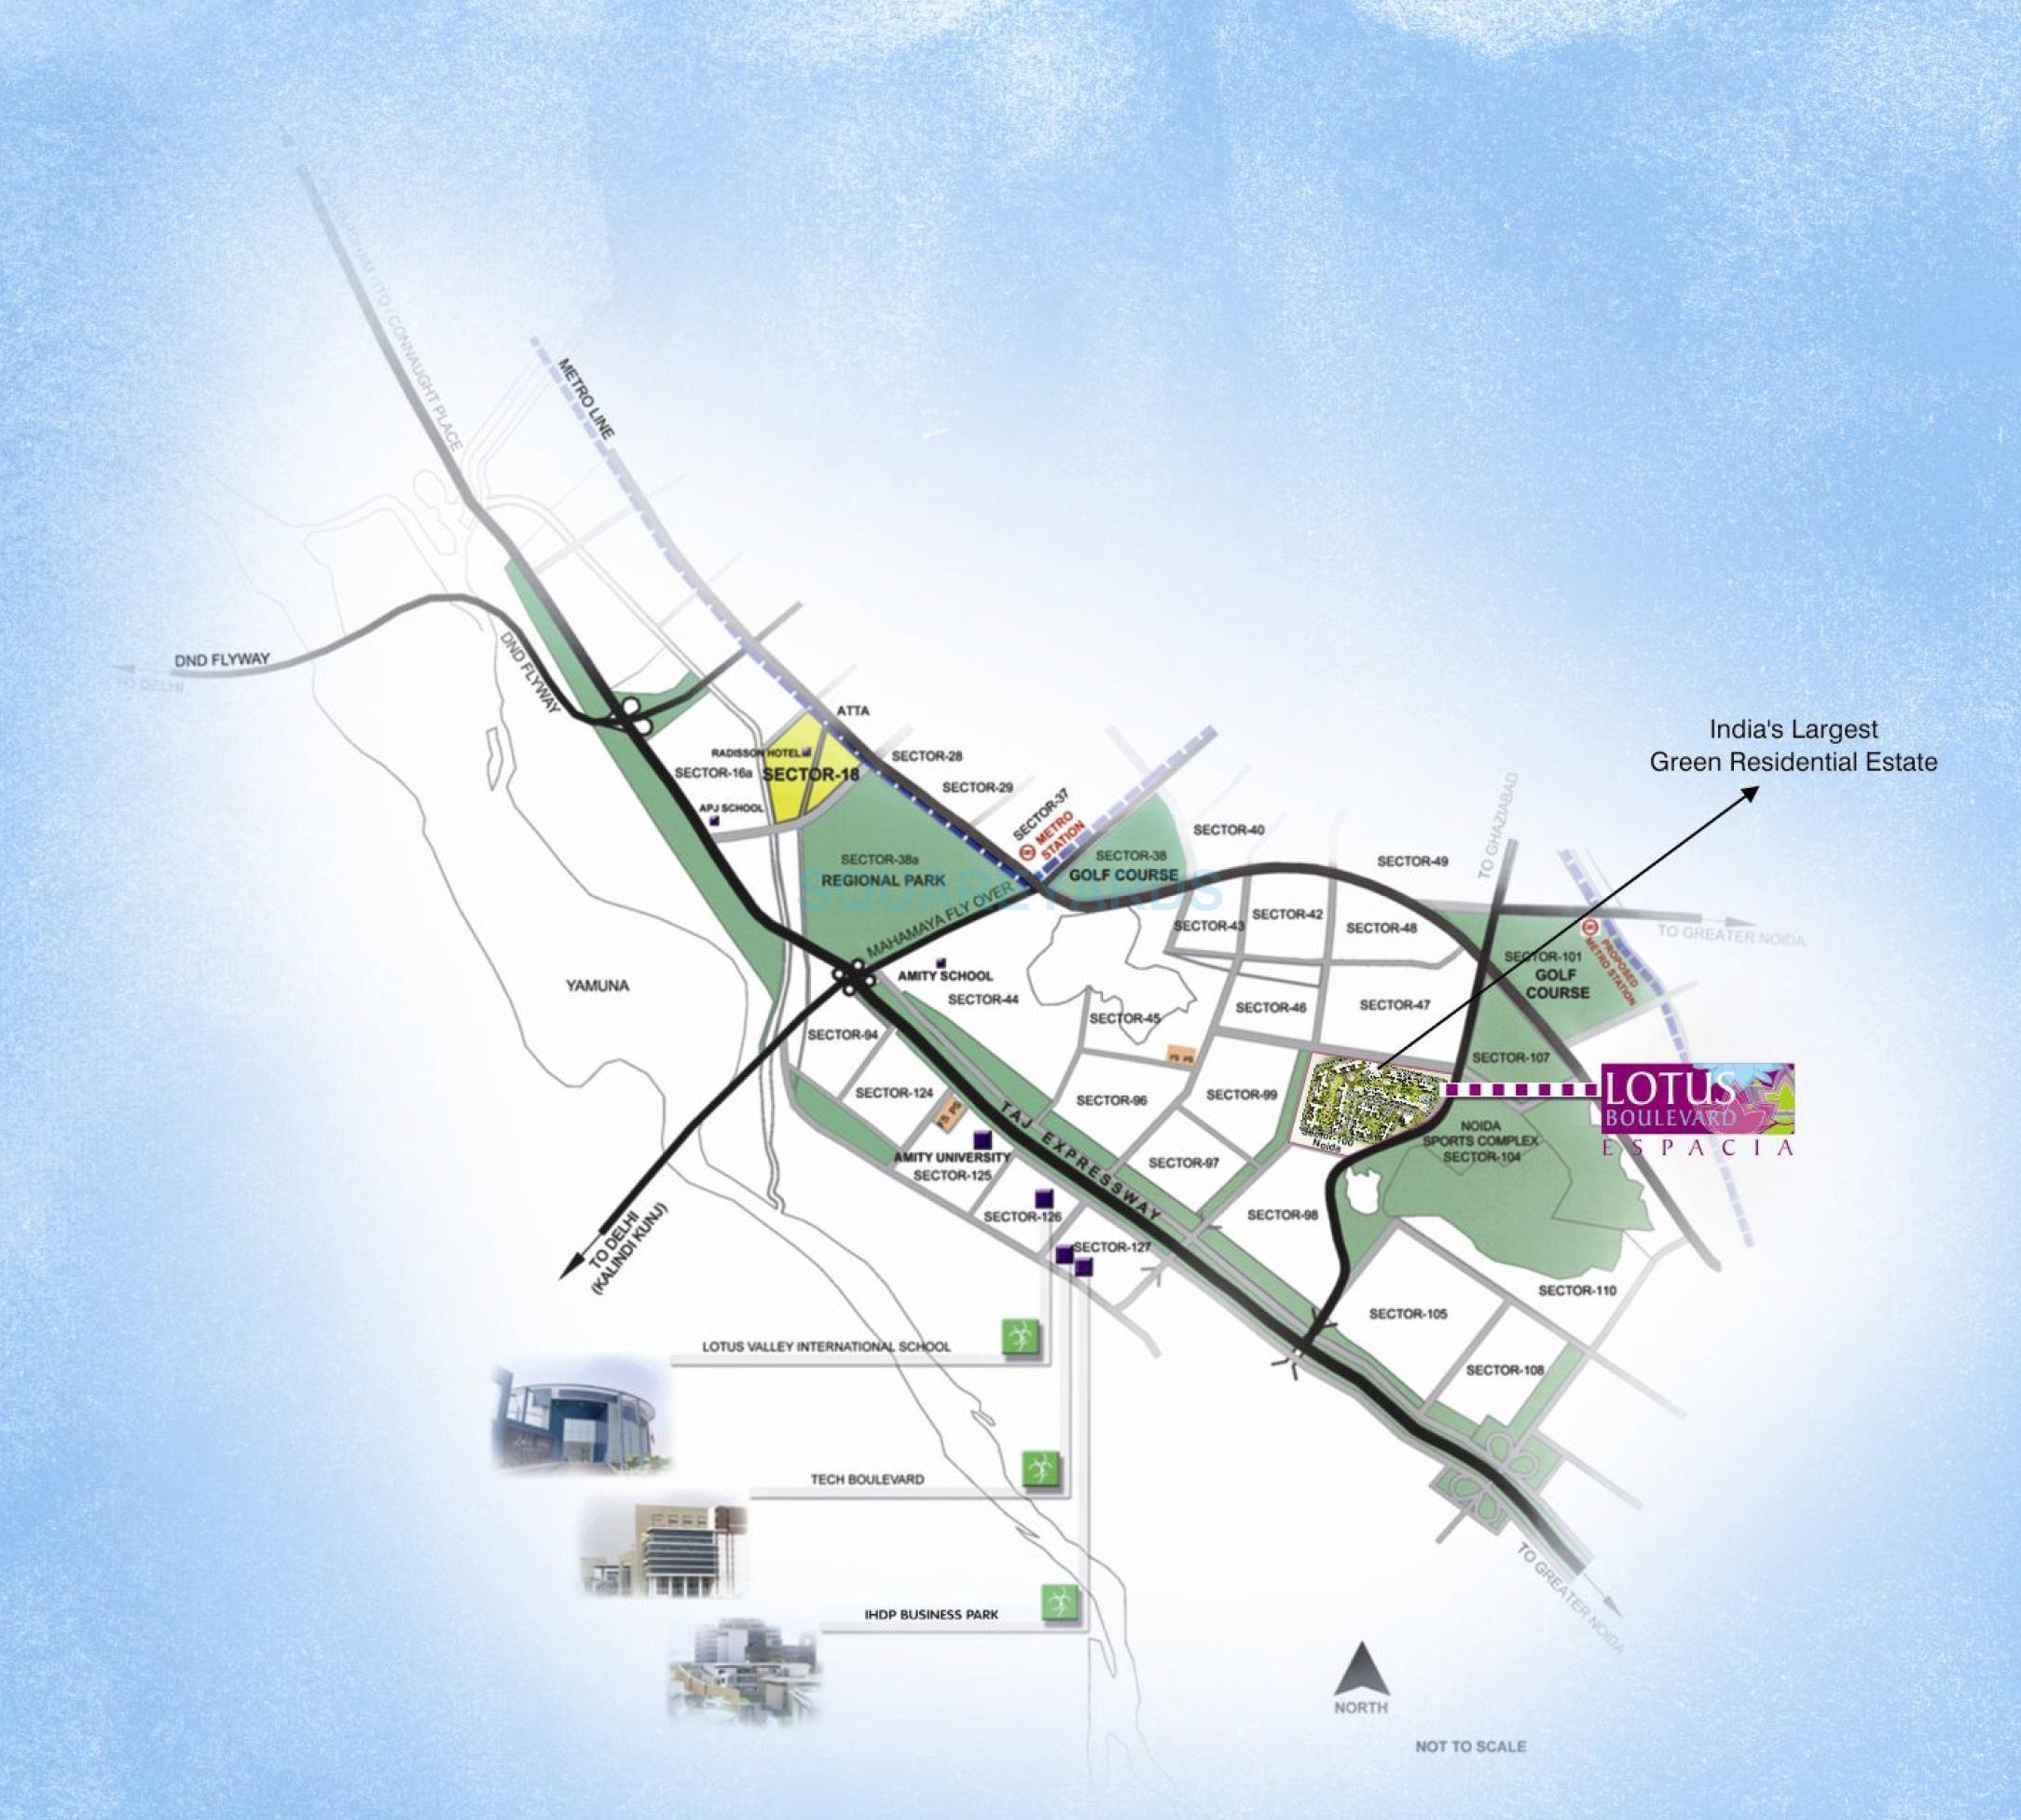 3c lotus boulevard espacia location image1